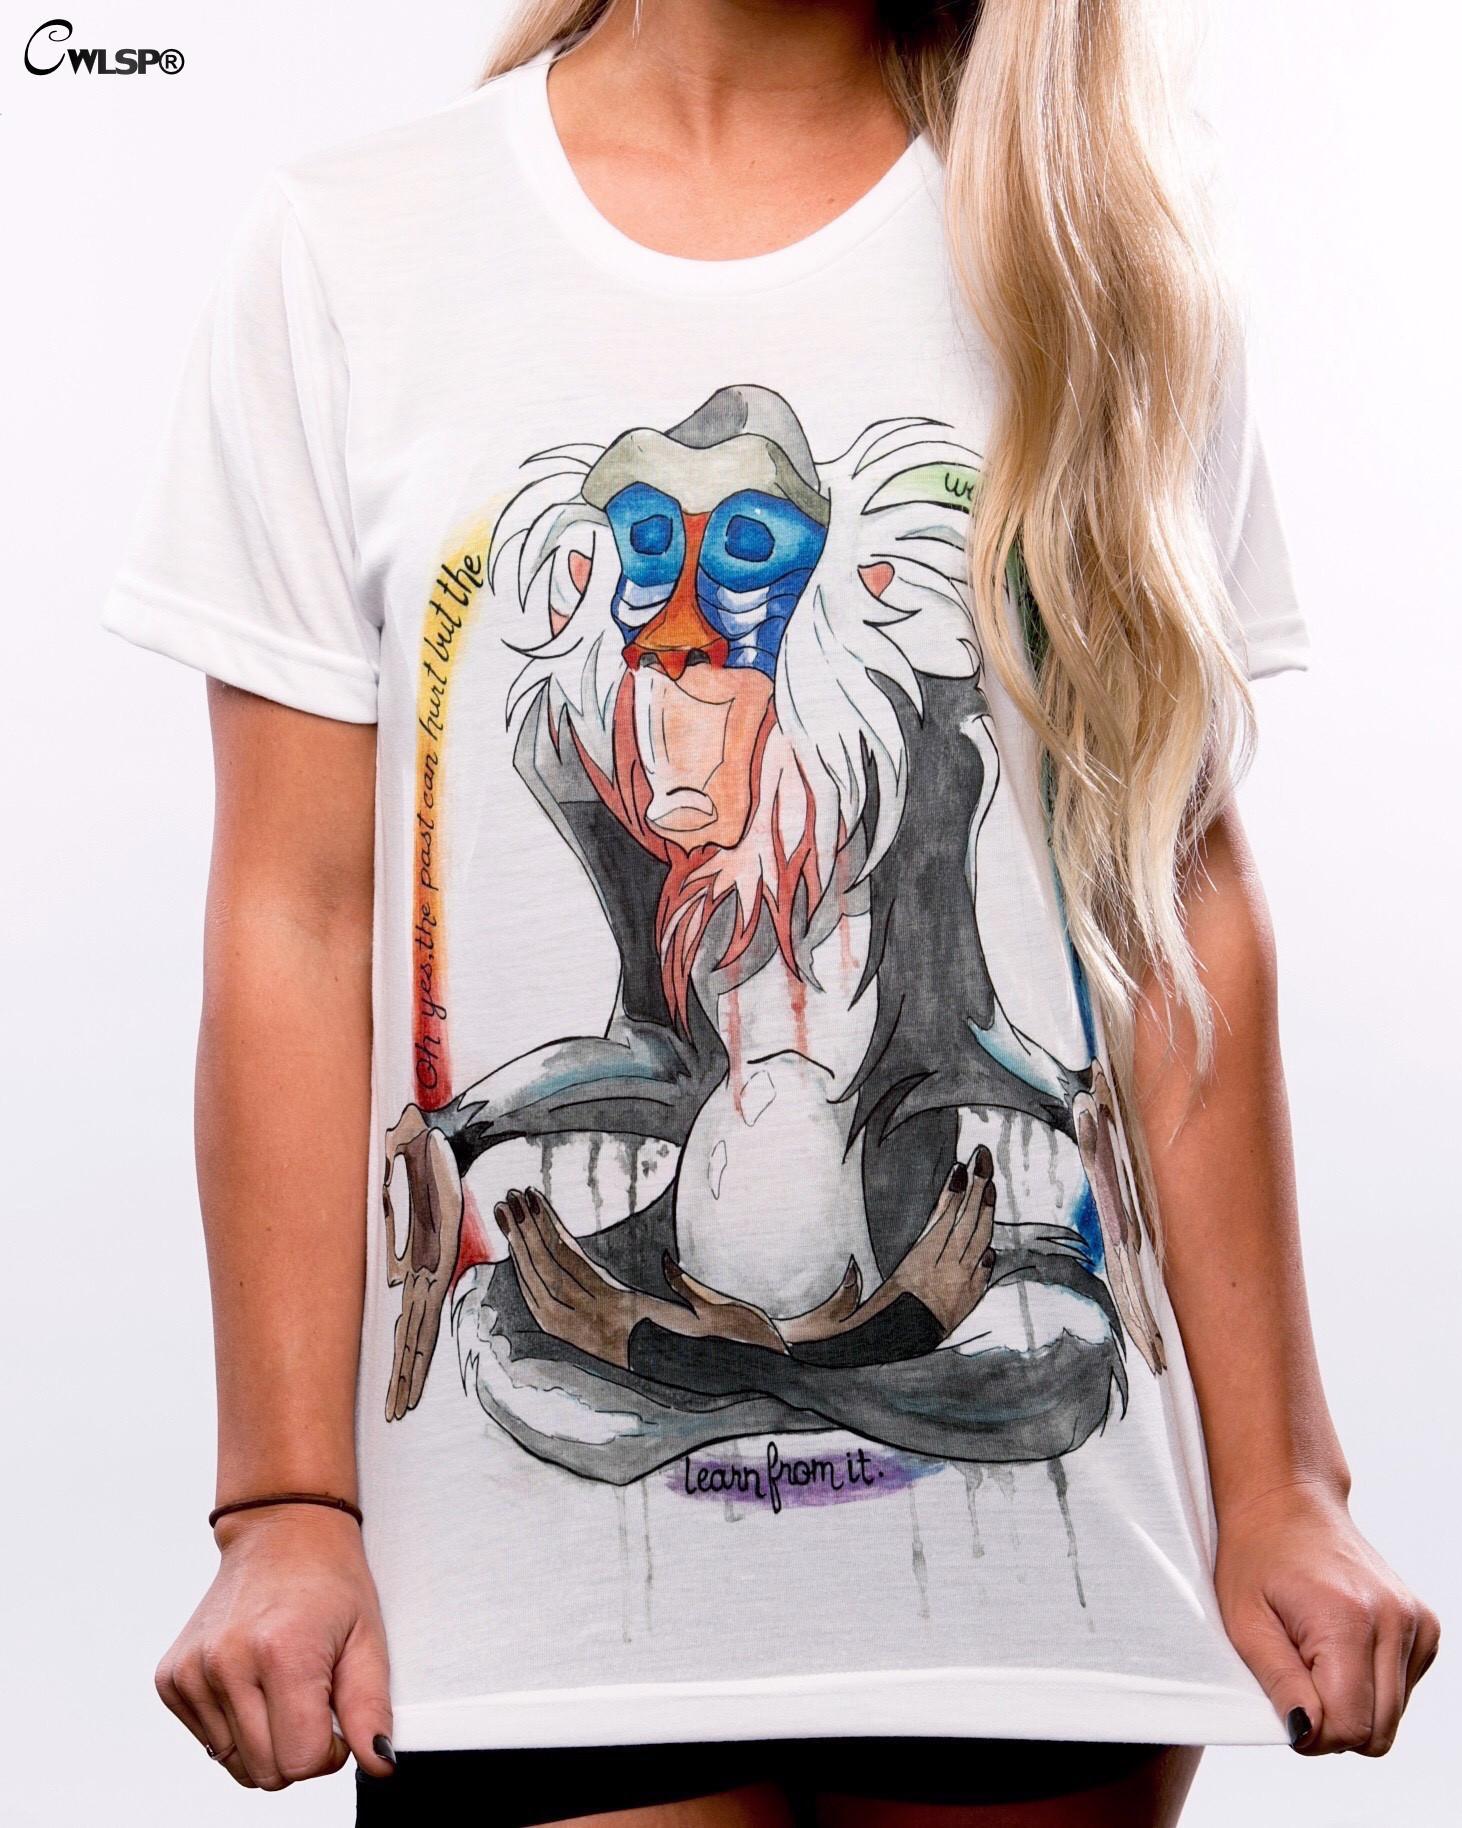 HTB1L3wxKXXXXXa1XXXXq6xXFXXXO - Summer Colorful Printed T shirt Women Fashion Letter Short Sleeve